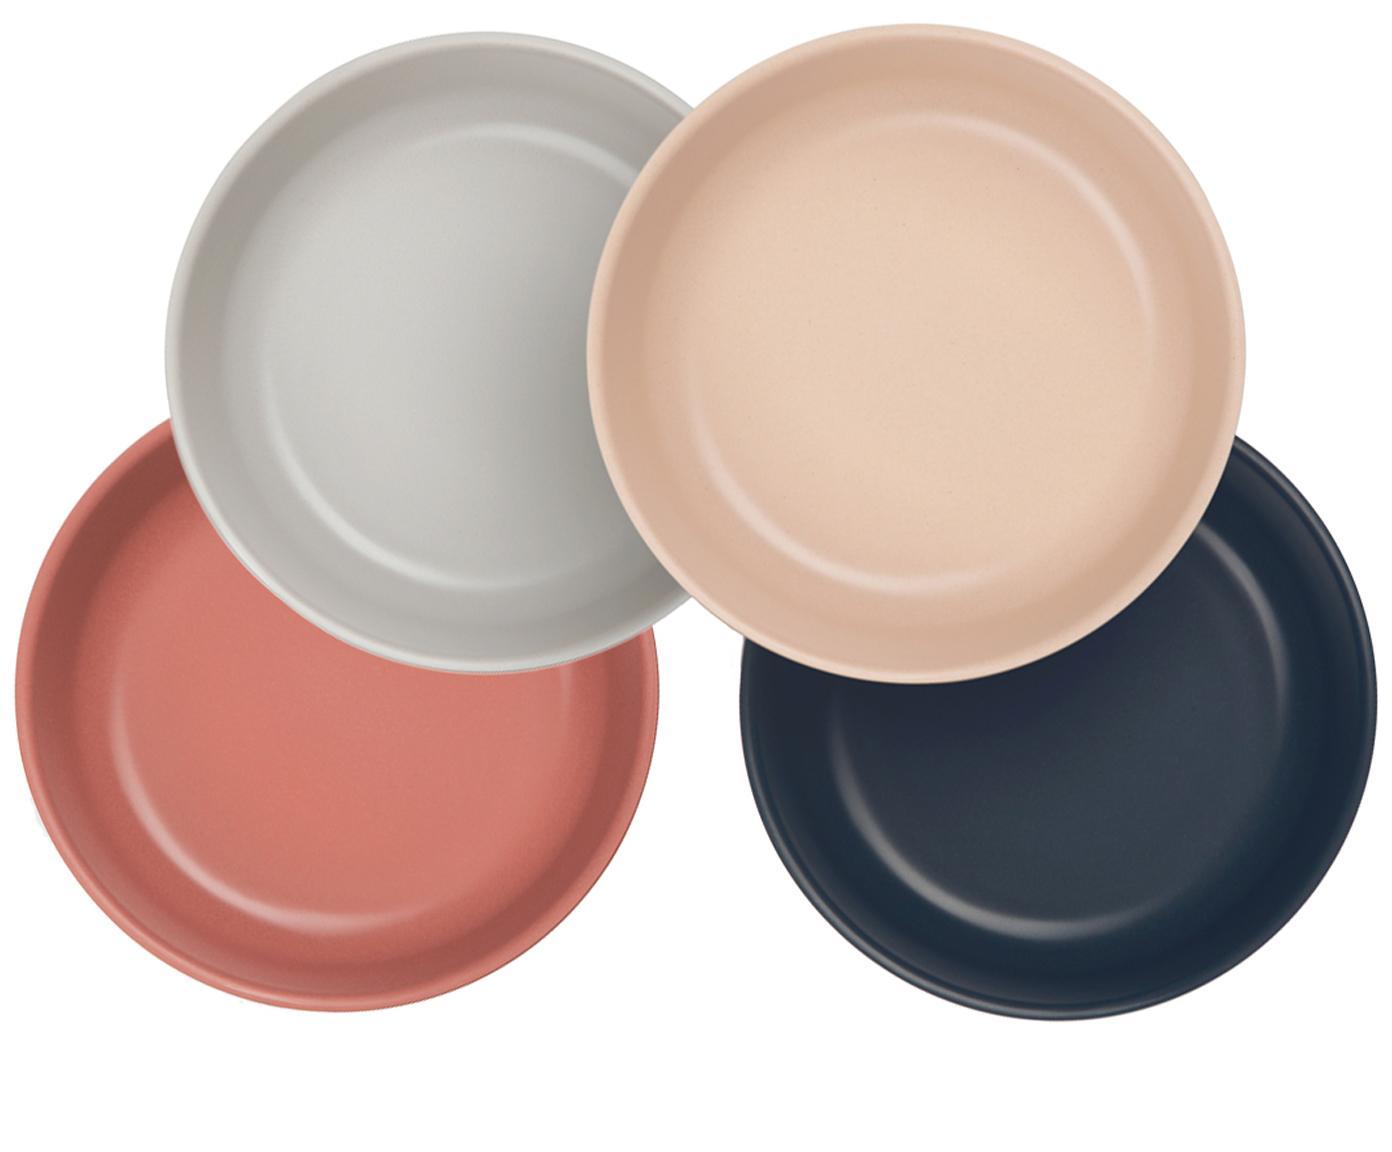 Schalenset Bambino, 4-delig, Bamboehoutvezels, melamine, voedselveilig BPA-, PVC- en ftalatenvrij, Zalmkleurig, lichtgrijs, grijs, terracottarood, Ø 15 x H 5 cm